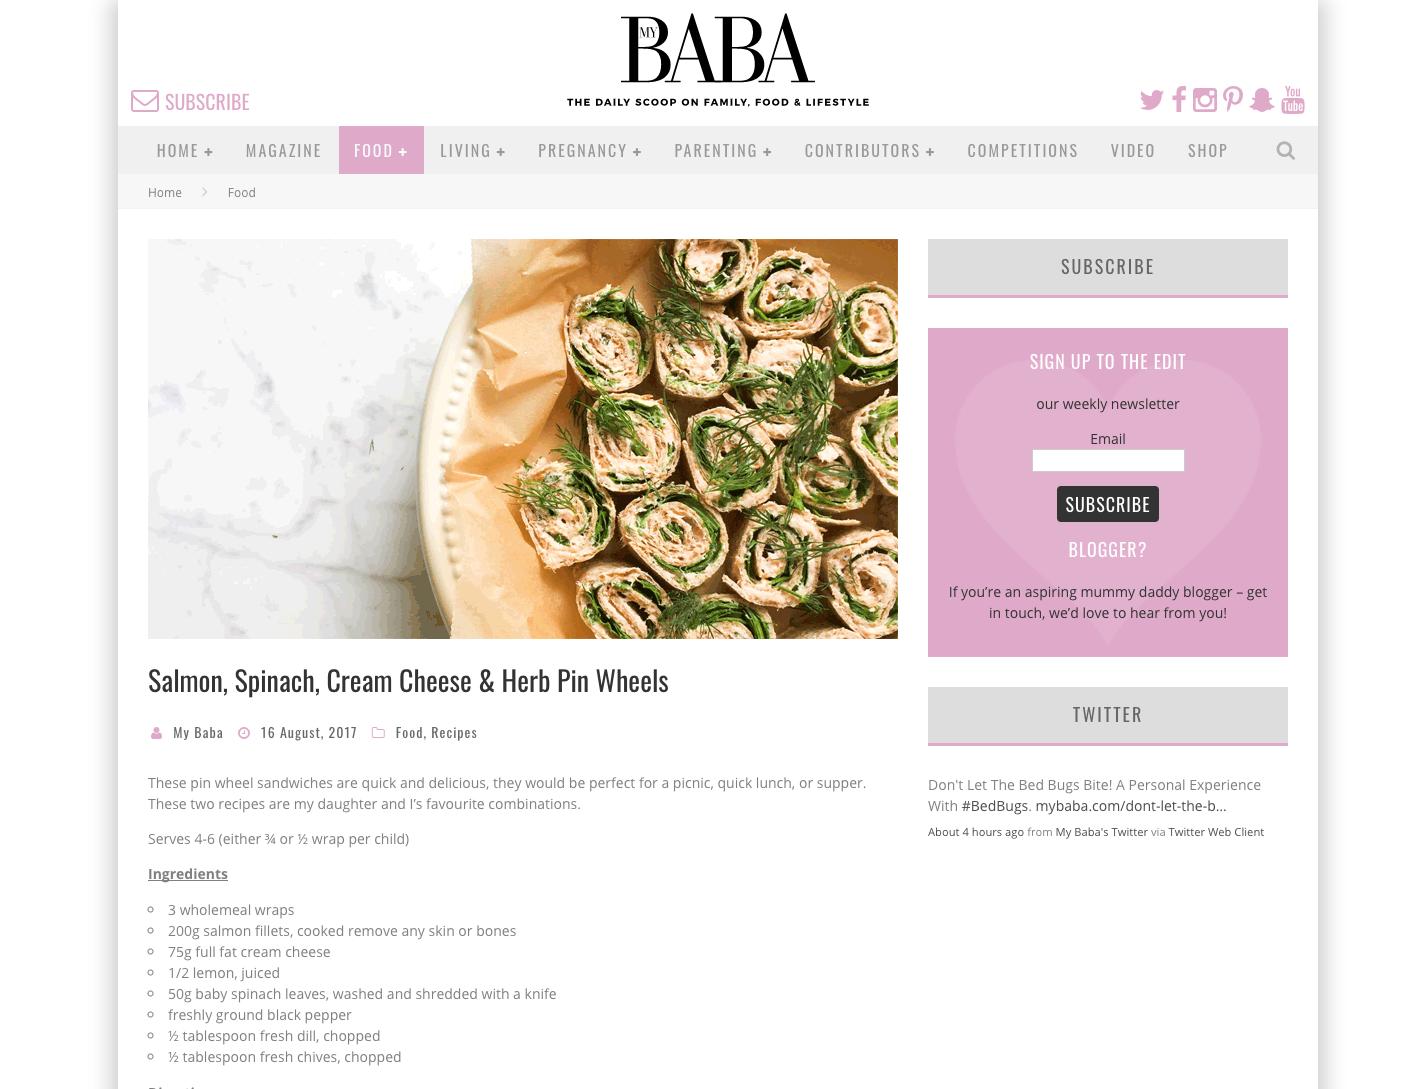 screencapture-mybaba-salmon-spinach-cream-cheese-herb-pin-wheels-1511833640609.png